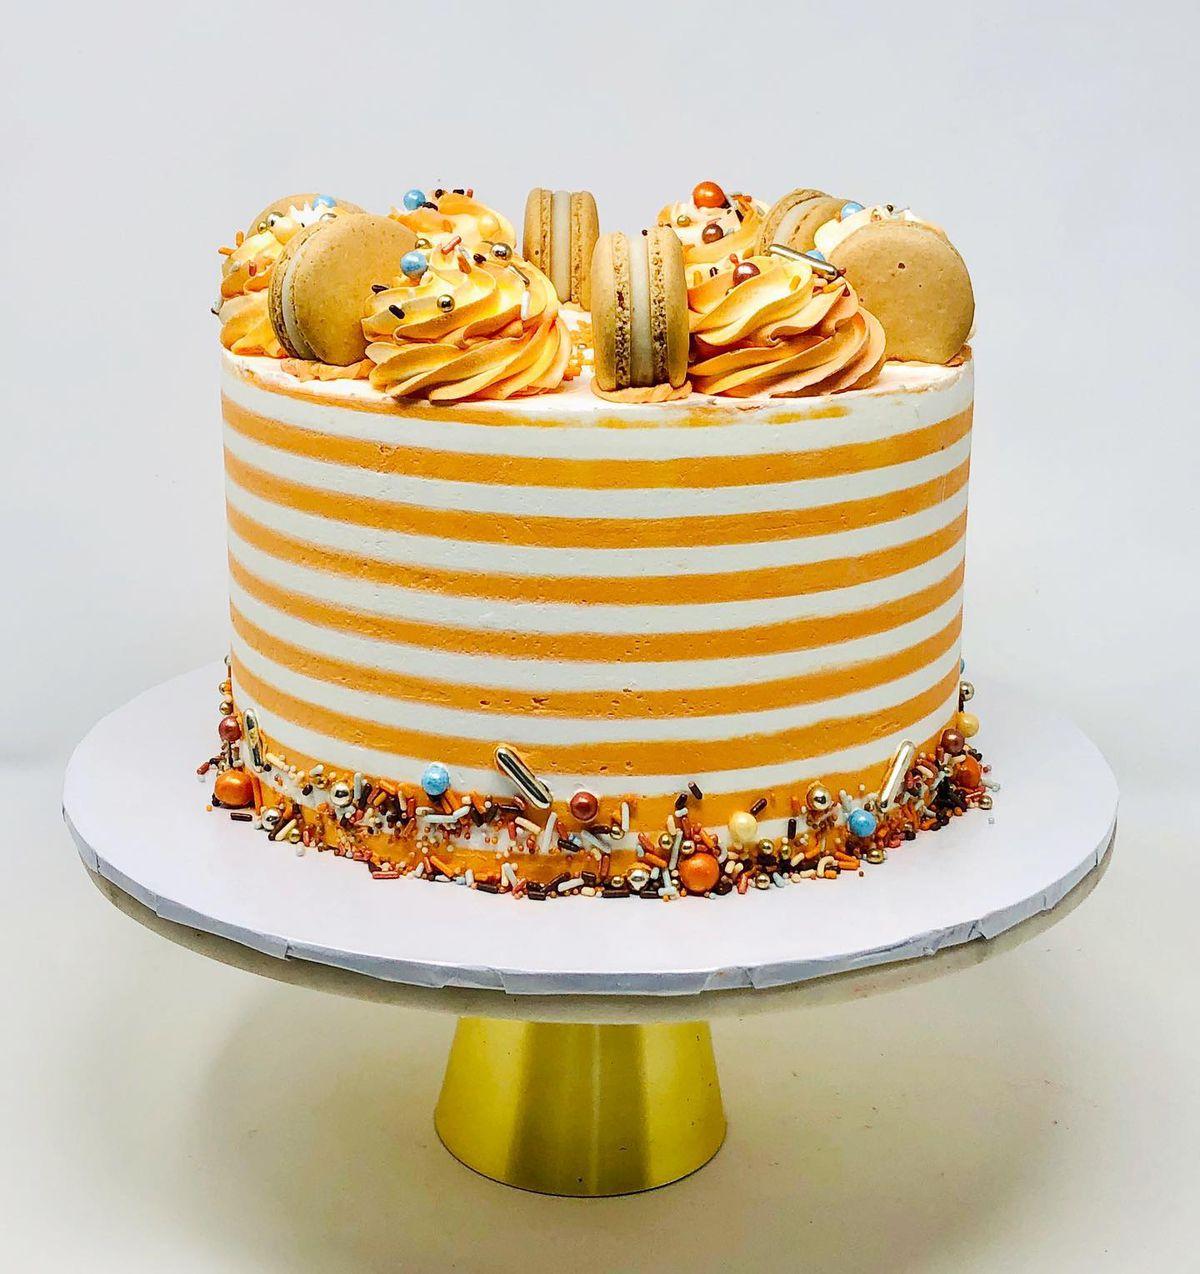 A cake from Rocheli Patisserie